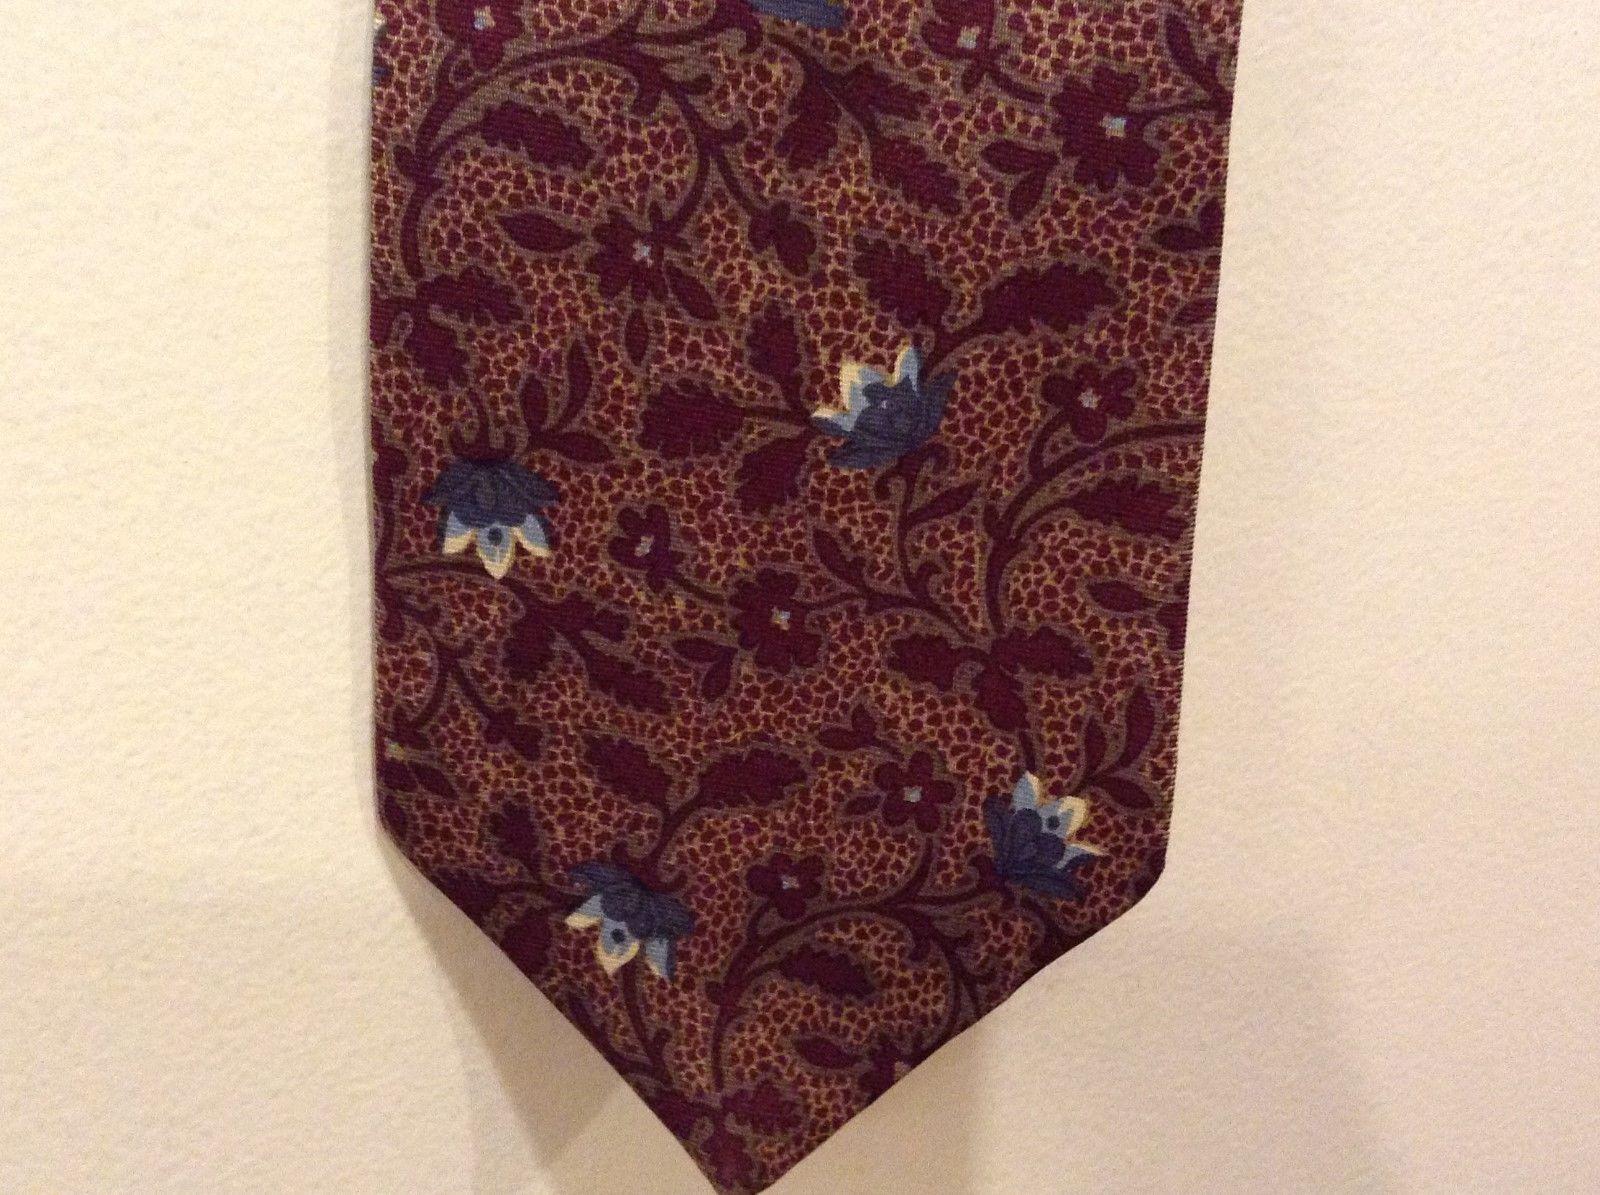 GAP Maroon Blue Lt Blue Beige Floral Imported Silk Neck Tie